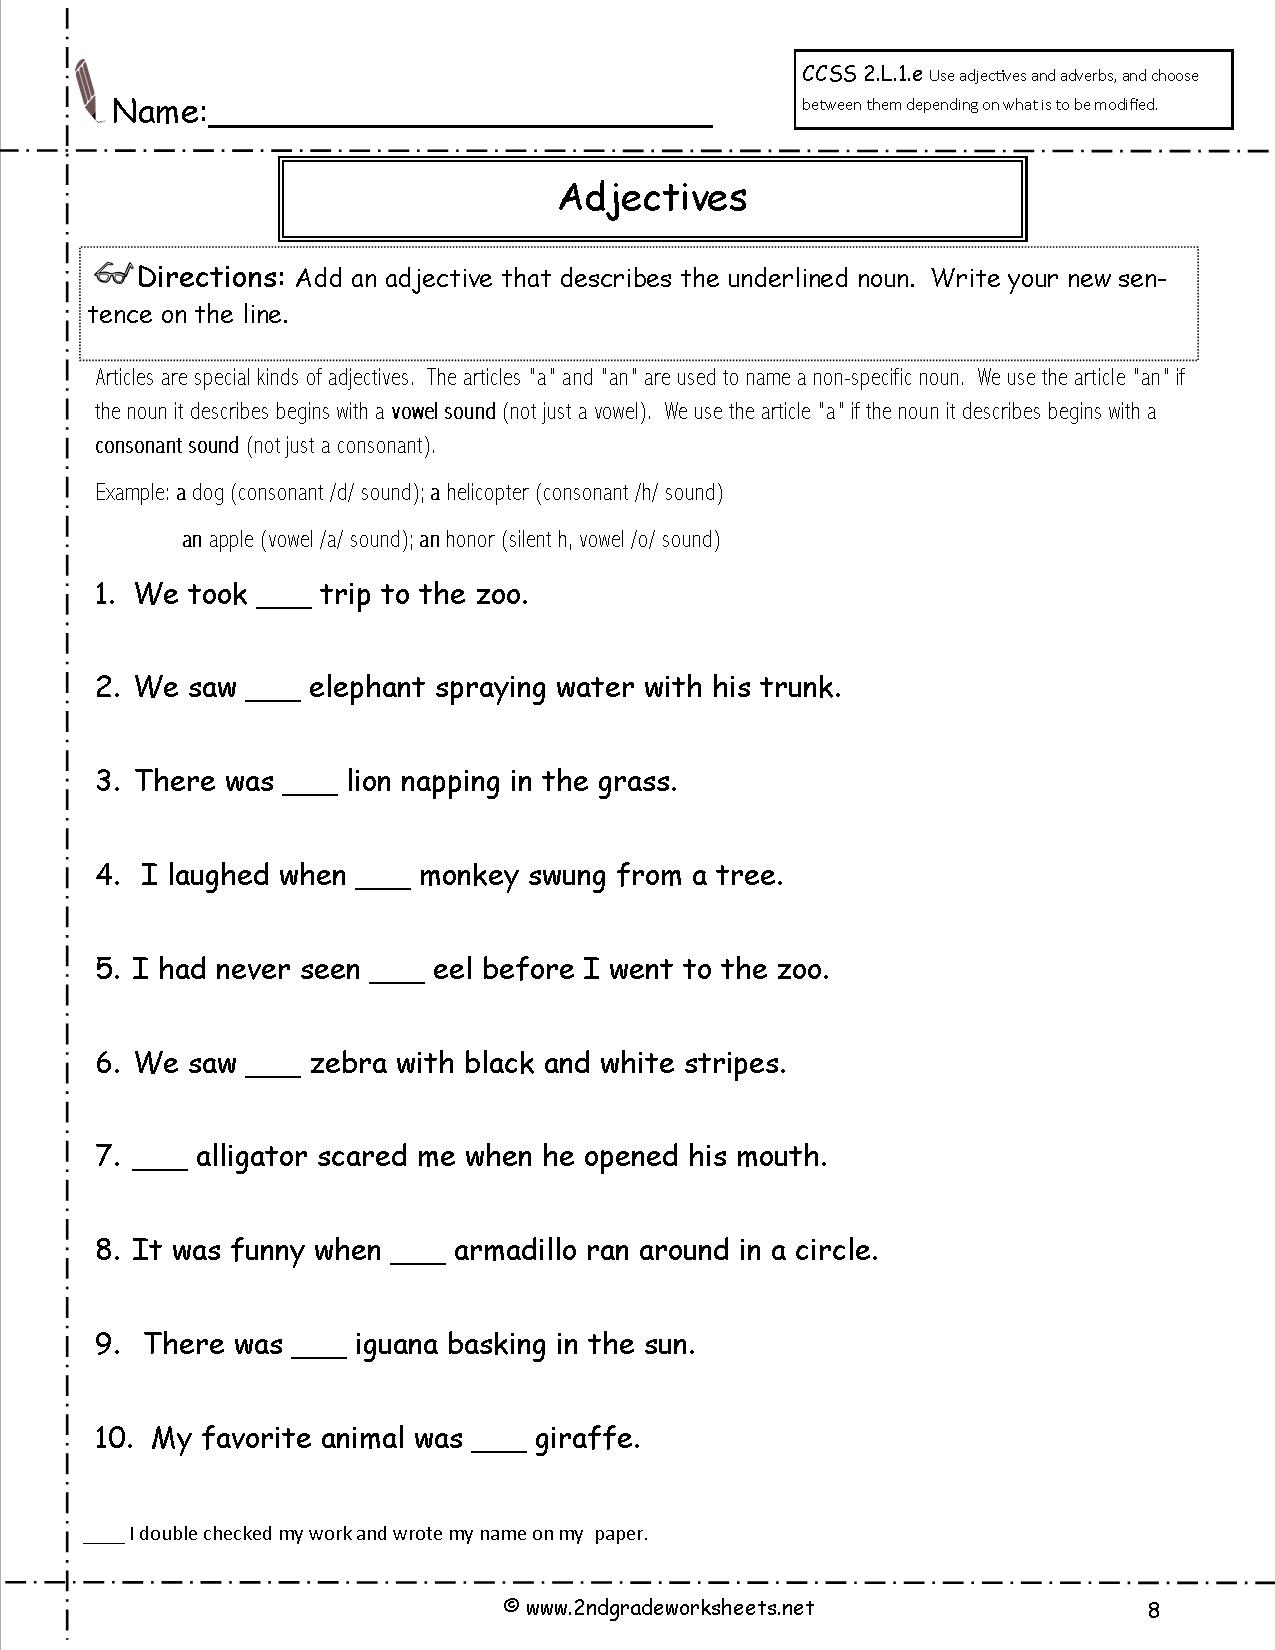 Free Language/grammar Worksheets And Printouts | Grammar Worksheets Year 6 Printable